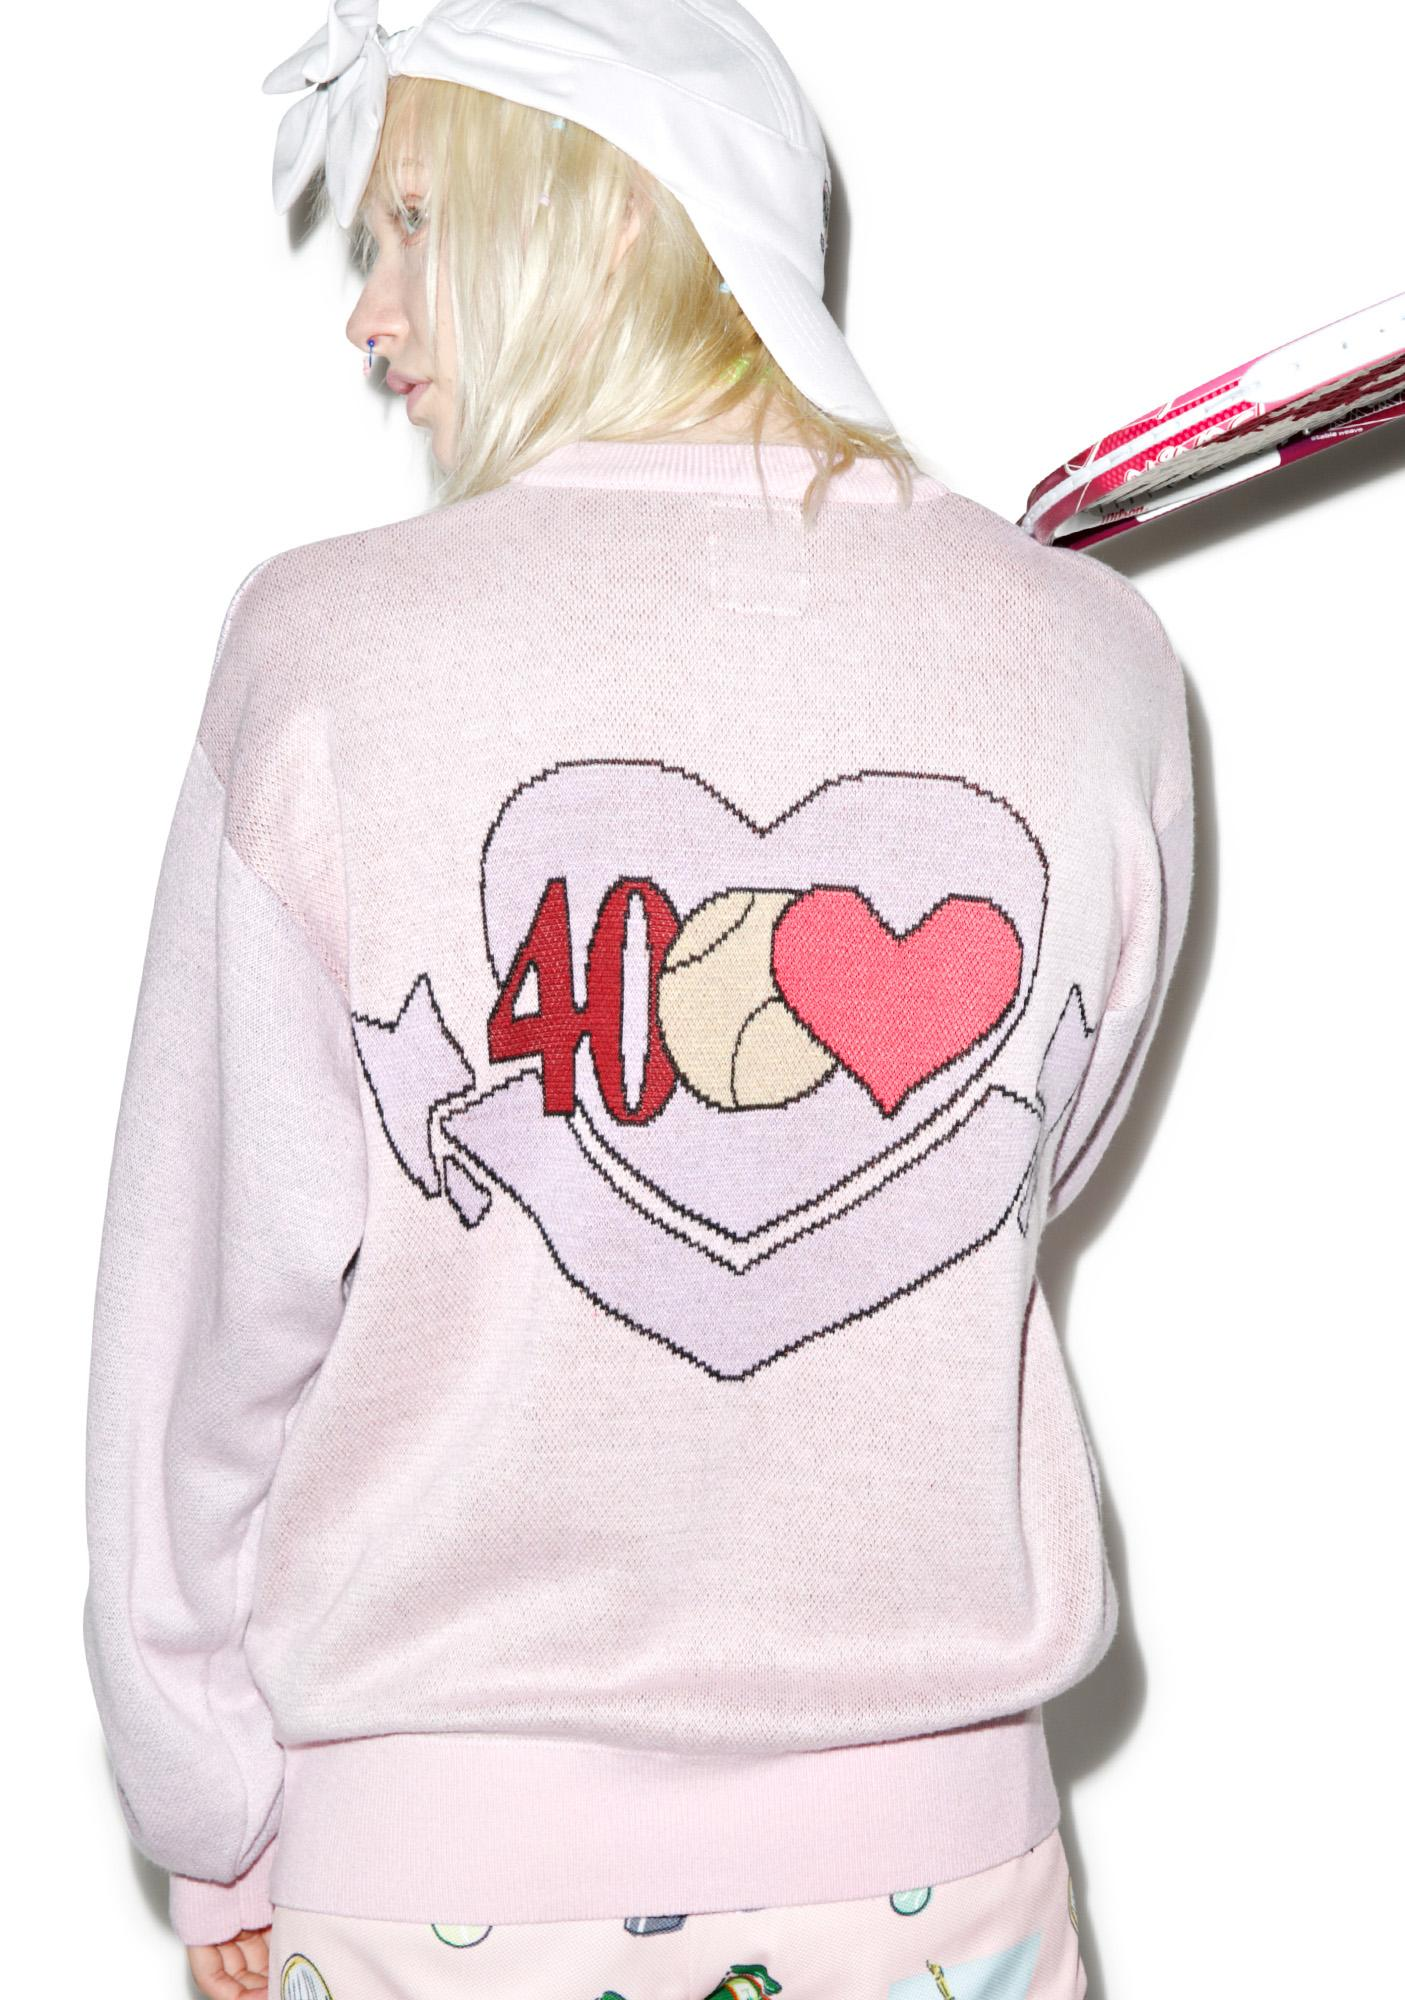 Joyrich 40Love Knit Crew